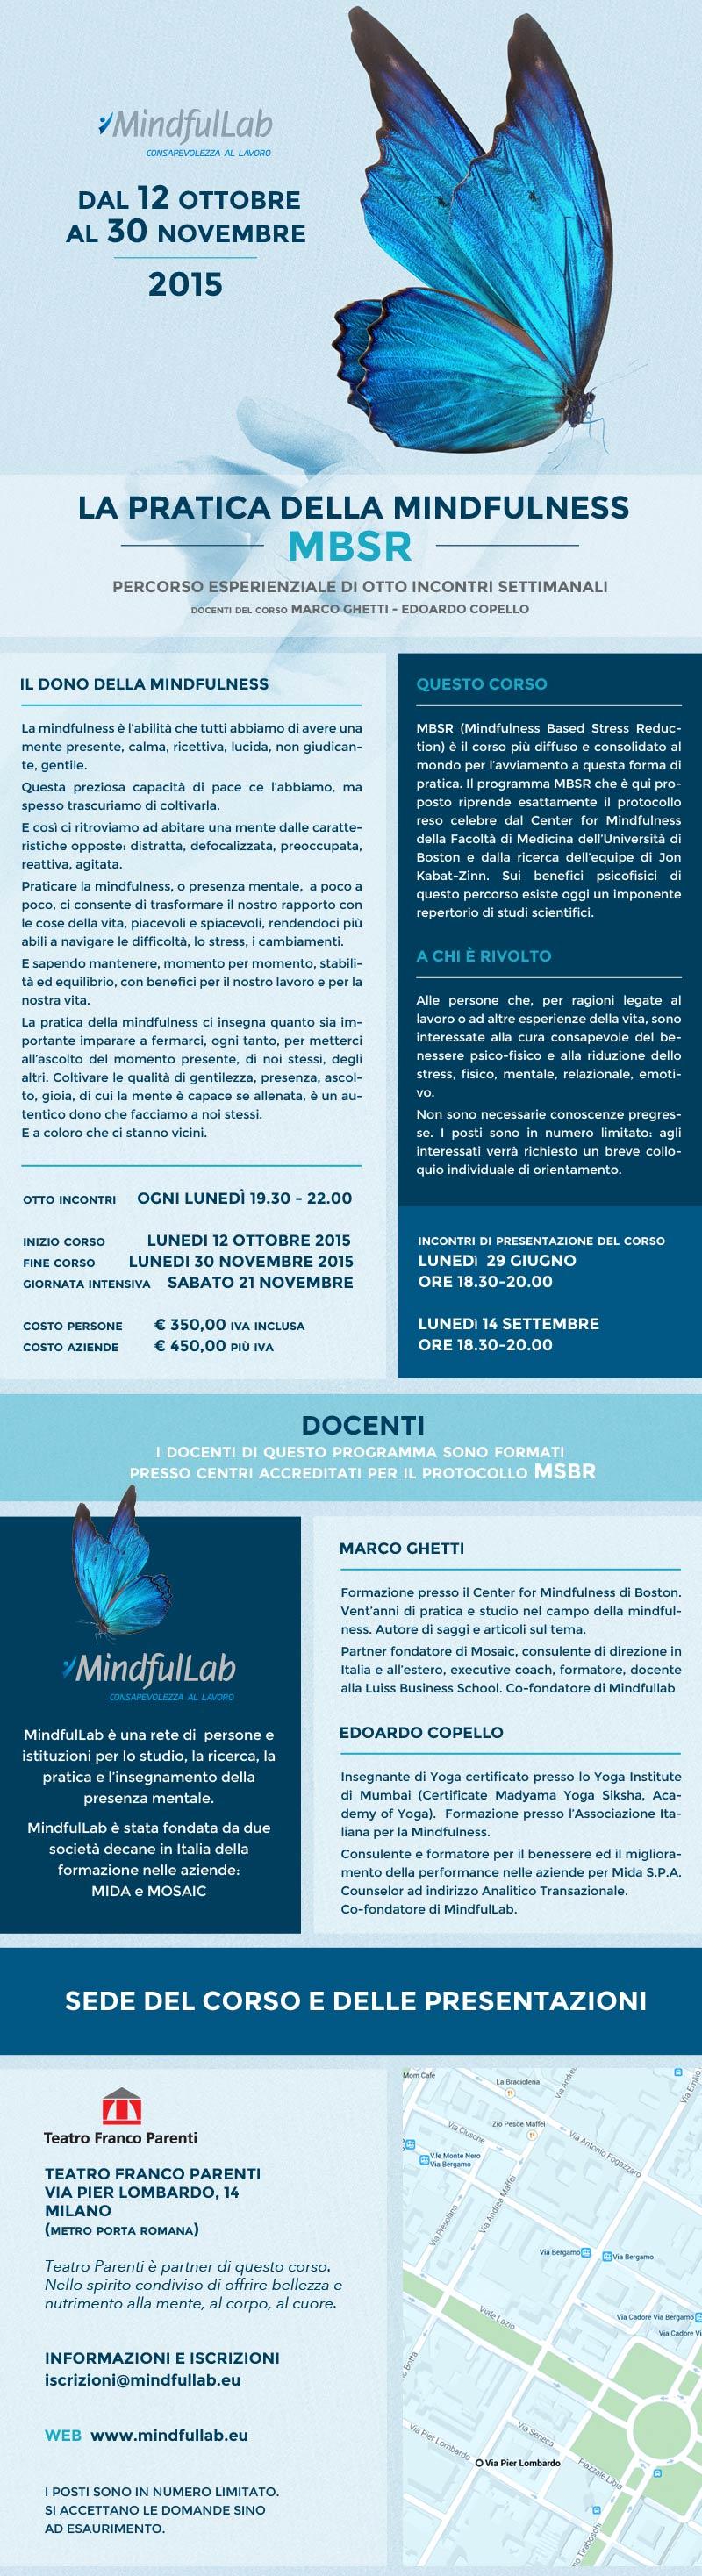 Locandina MindfulLab per corso sulla mindfulness